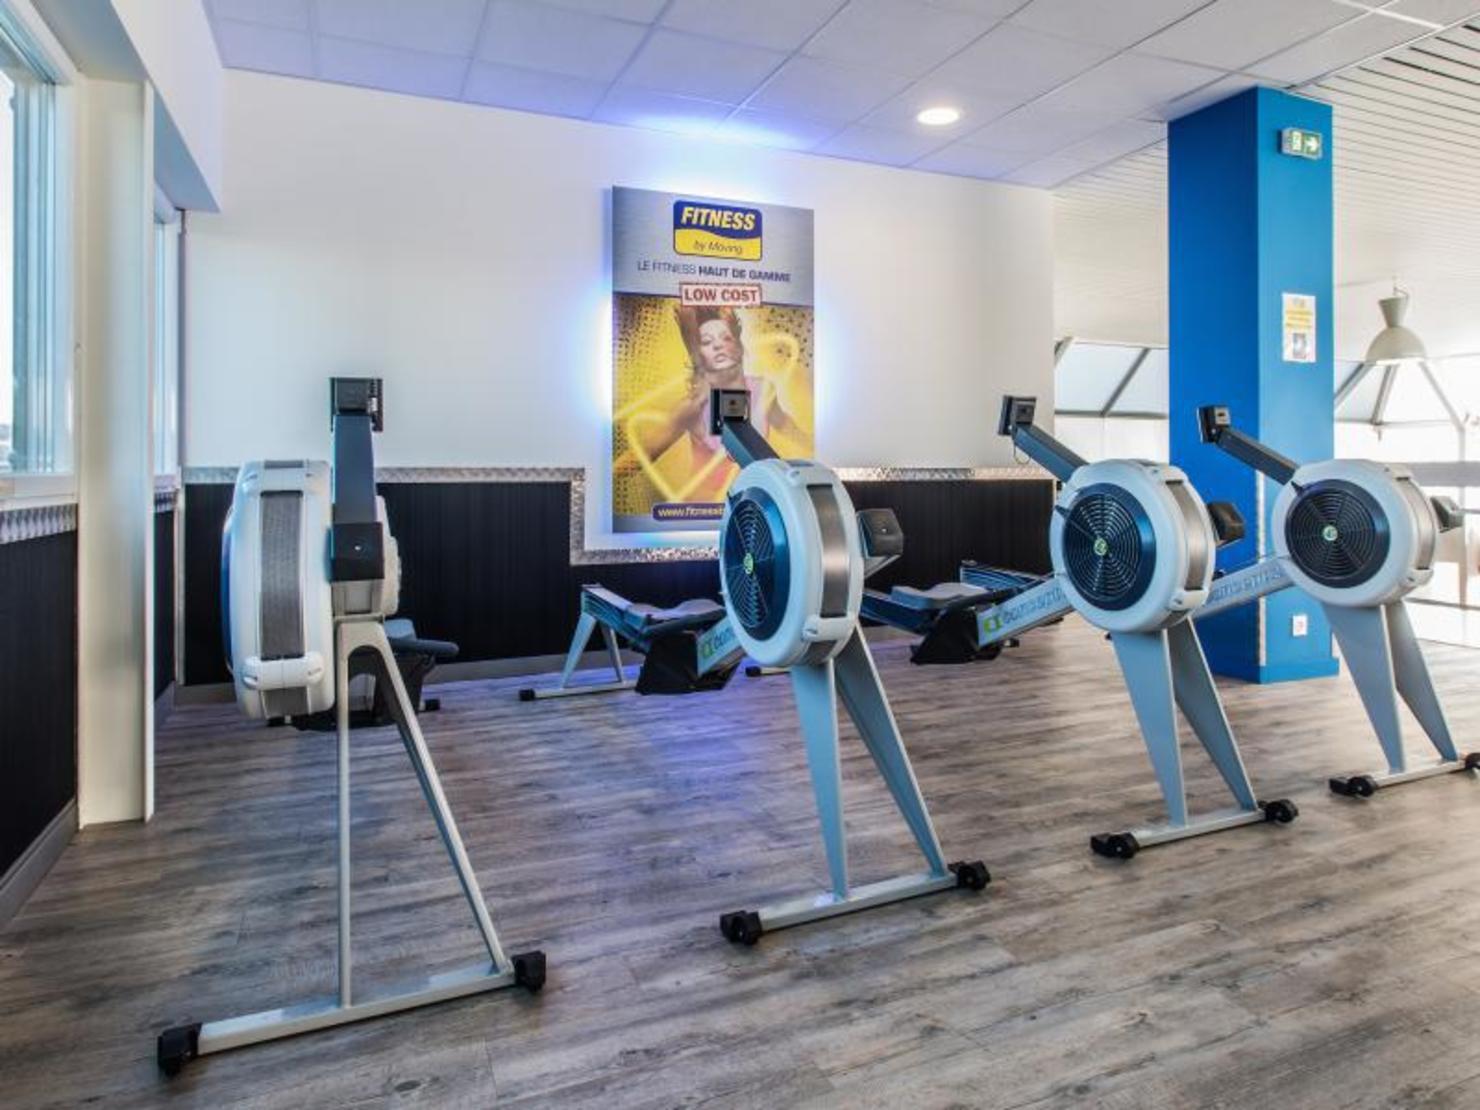 fitness by moving priest tarifs avis horaires essai gratuit